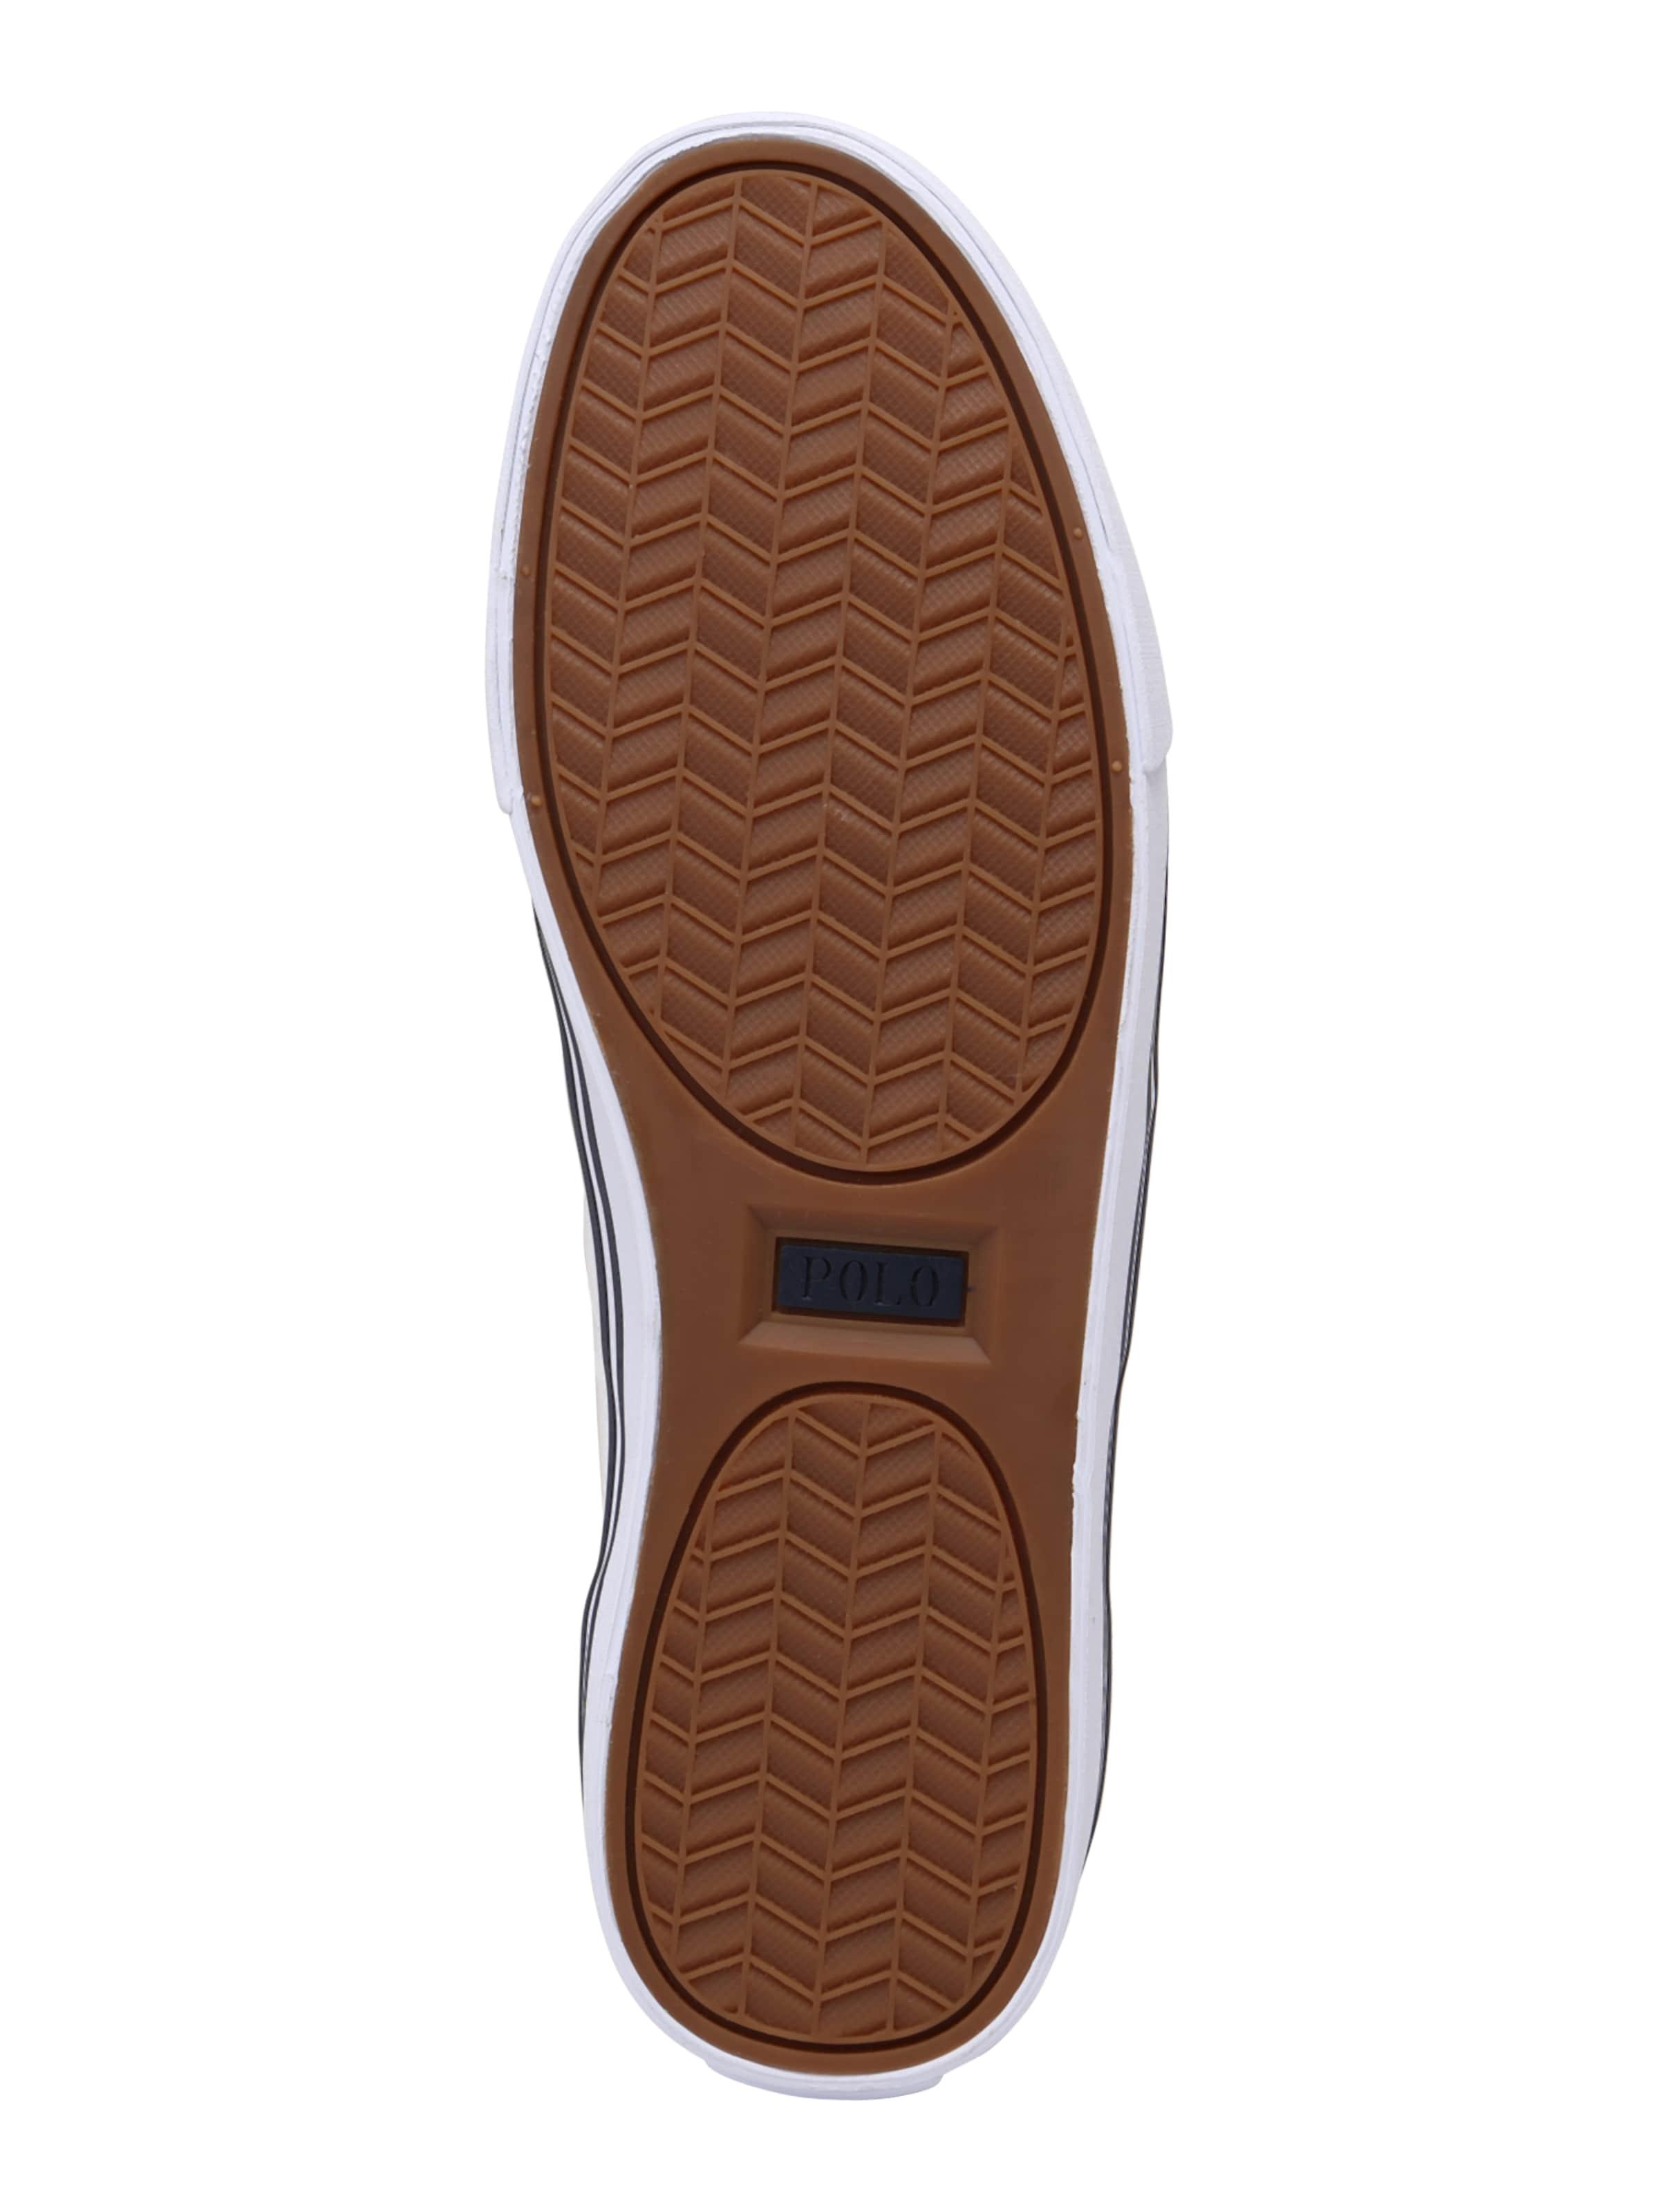 In Lauren Weiß Polo Sneaker 'hanford' Ralph Y76vyfbg